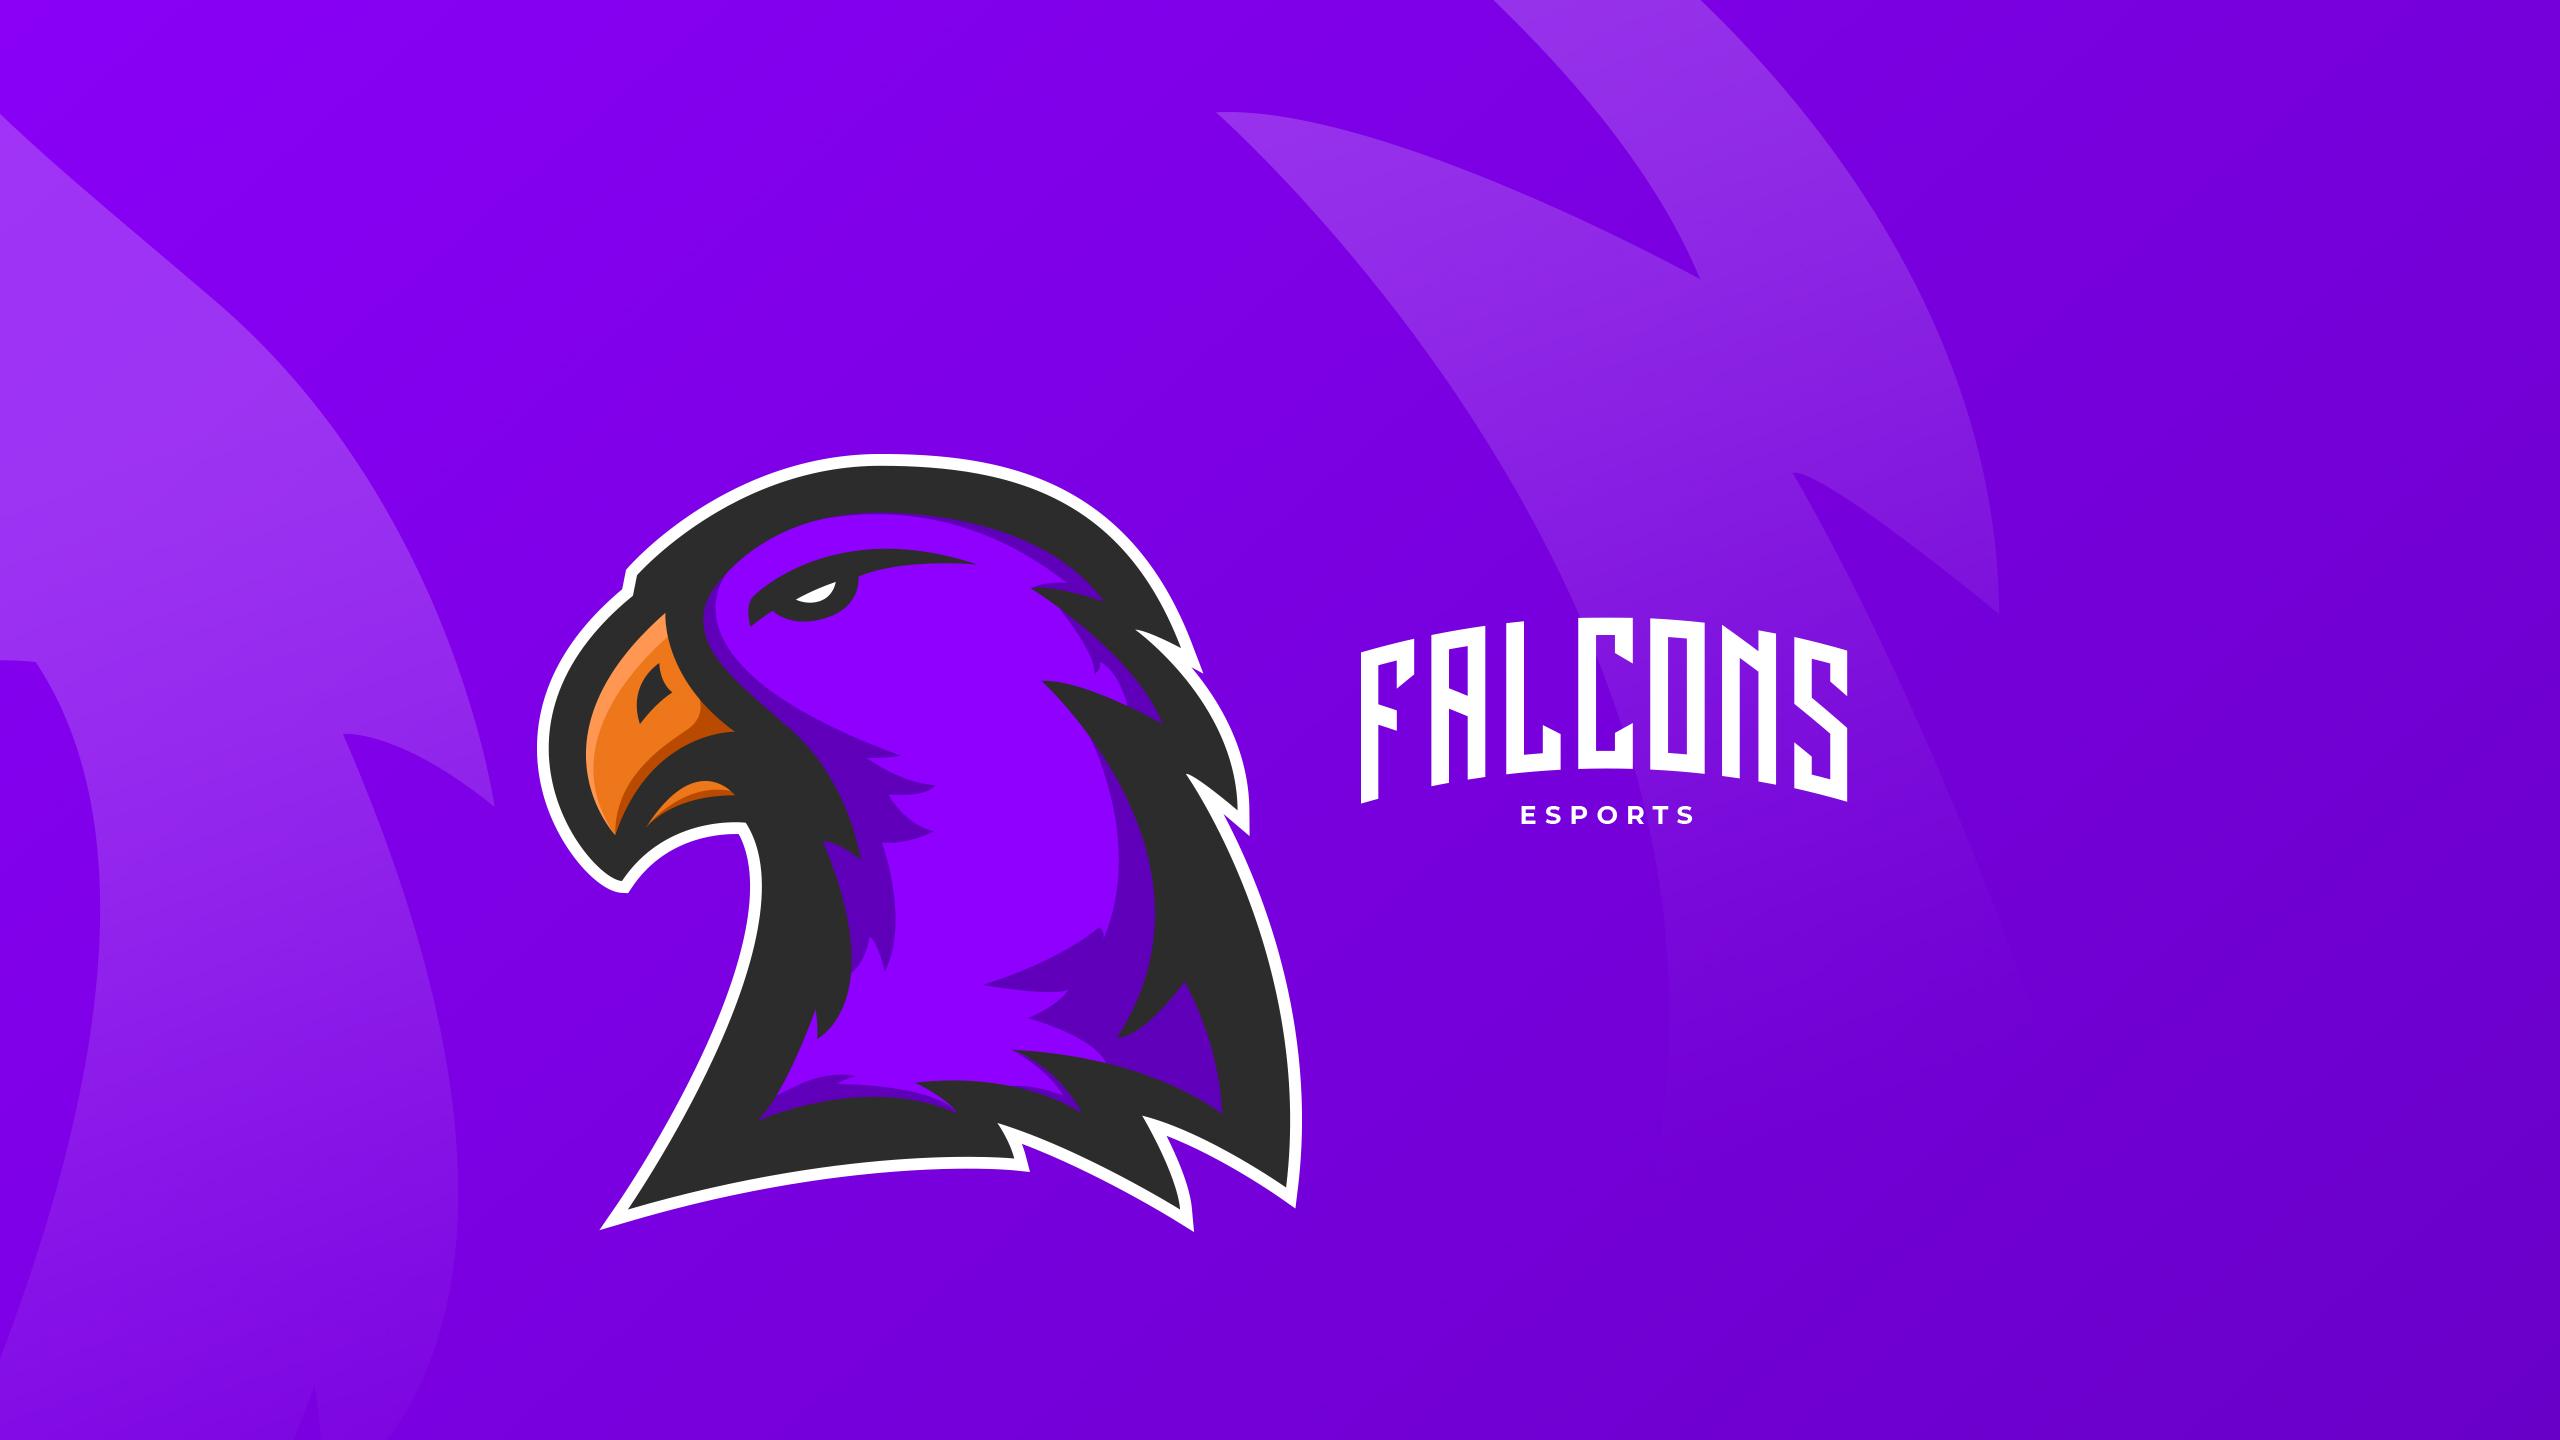 Background Farnborough Falcons